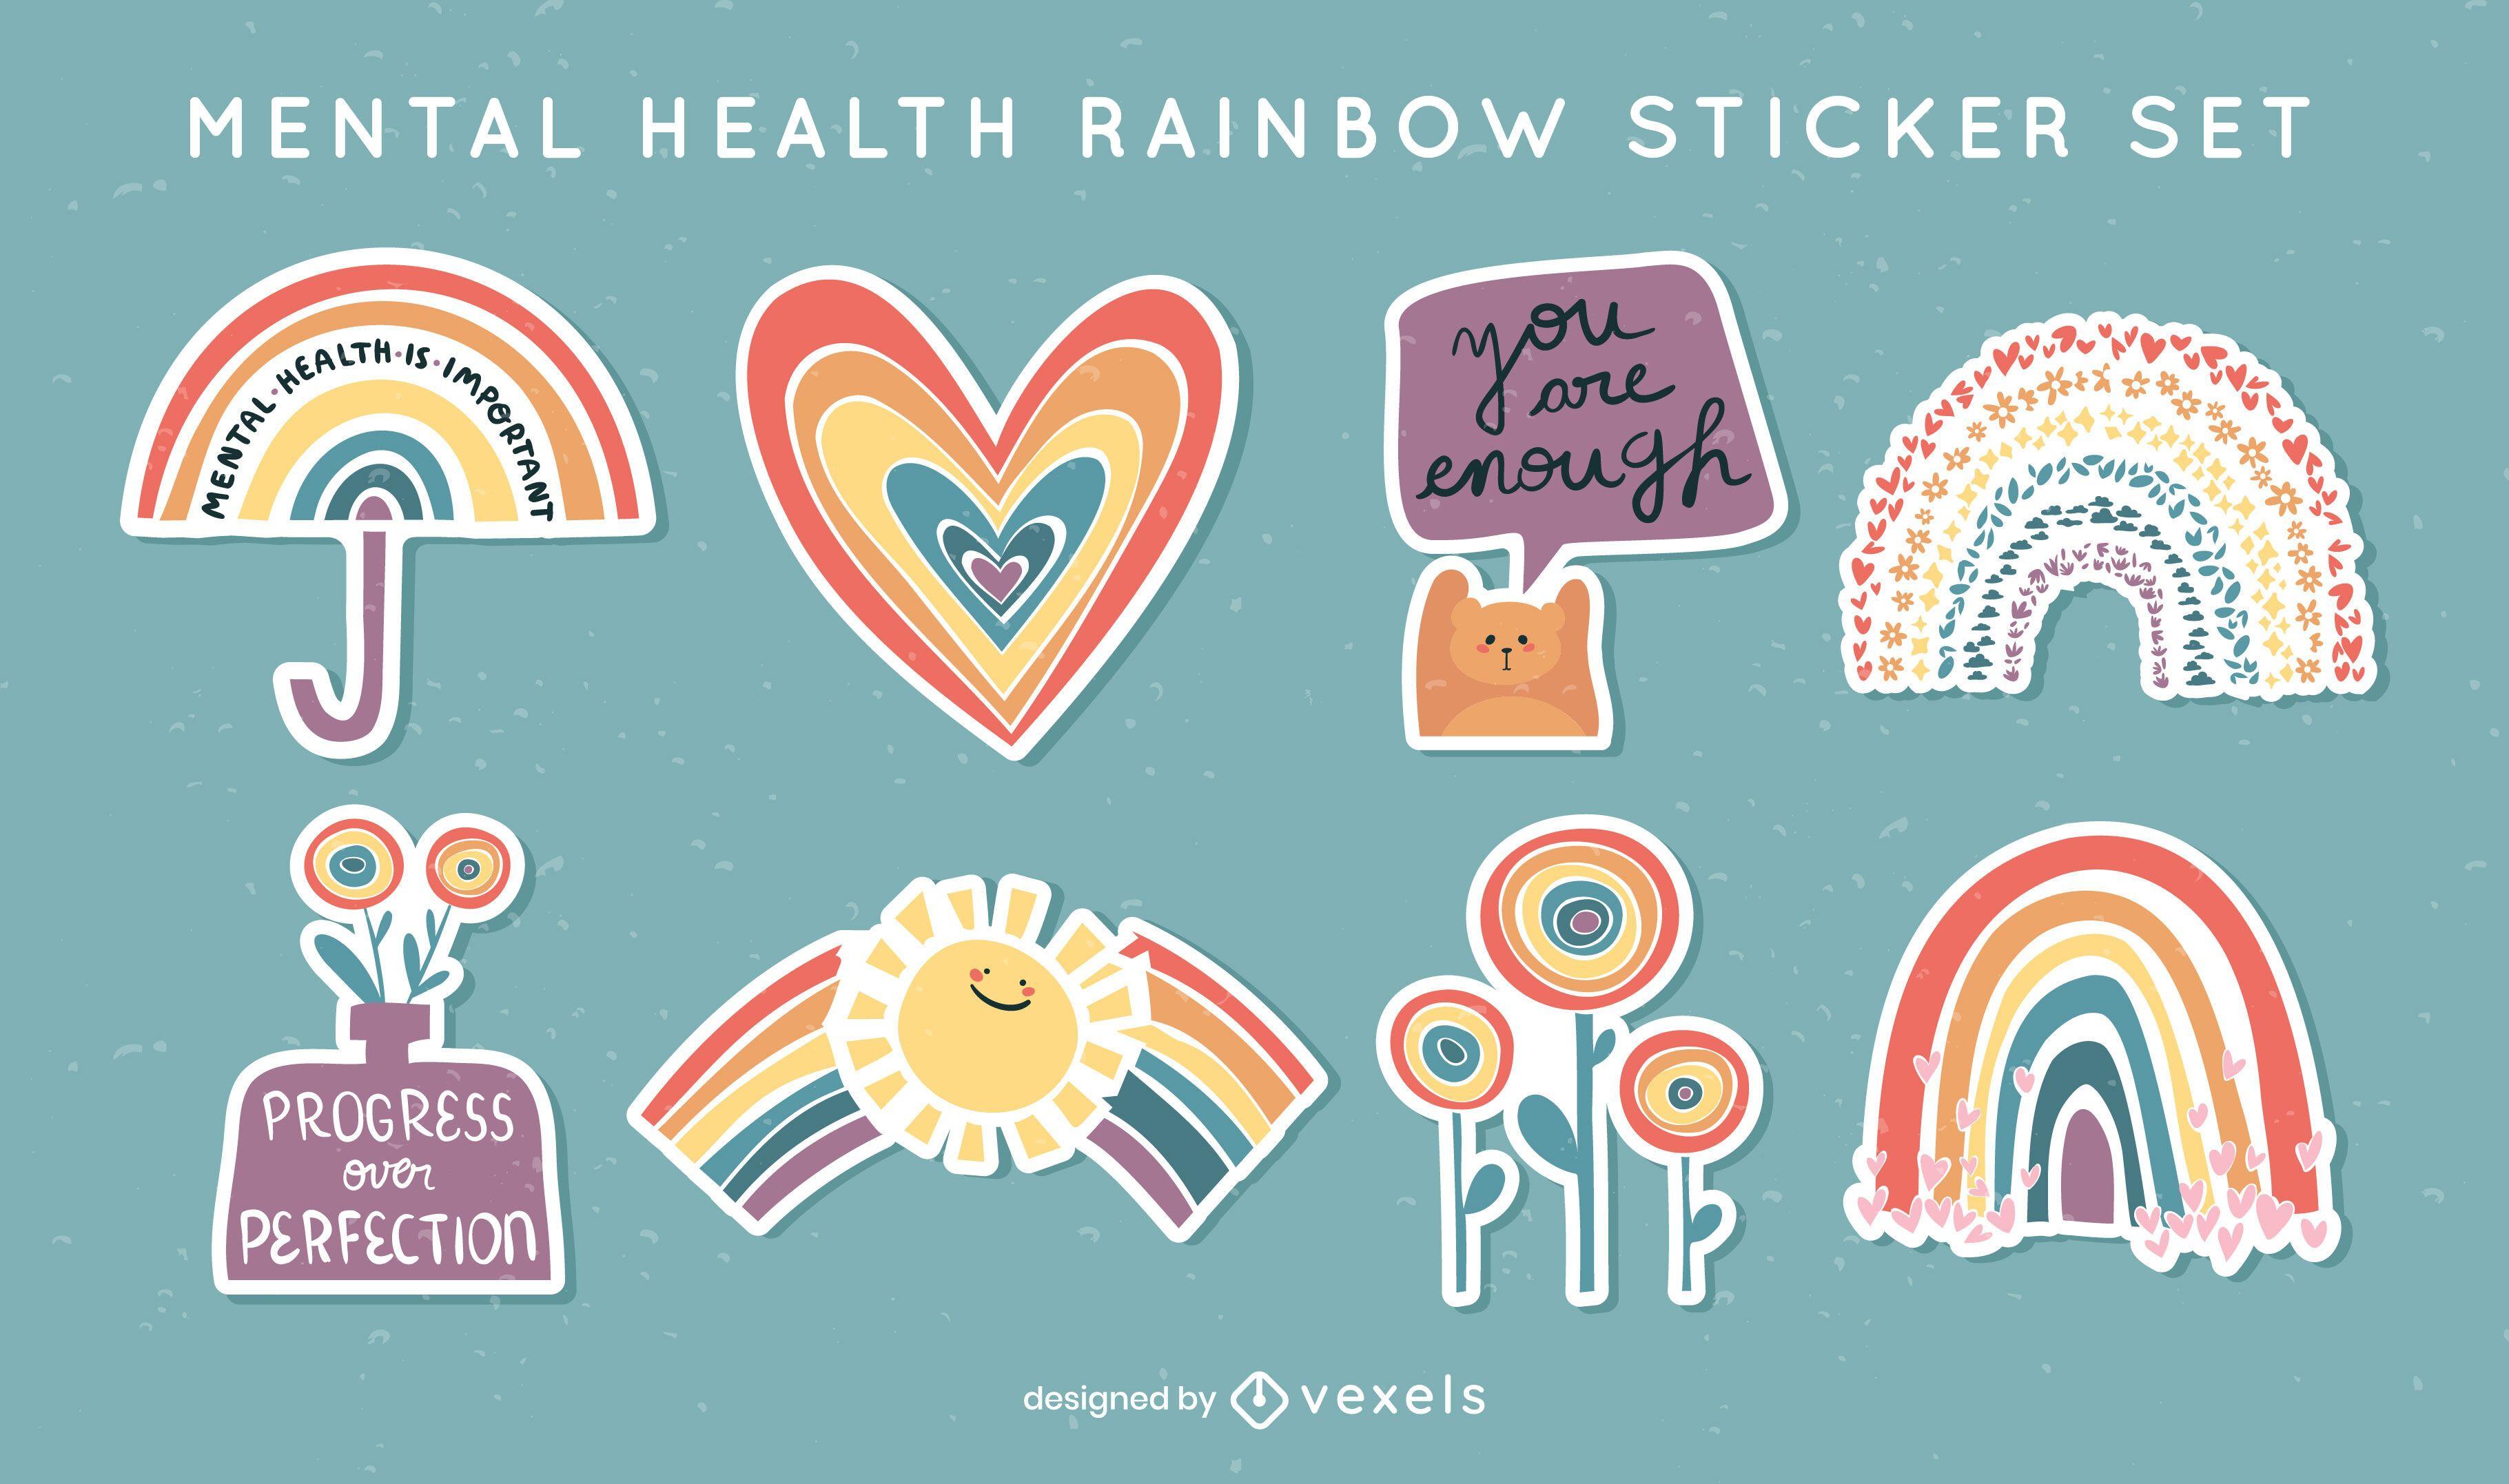 Mental health rainbows sticker set